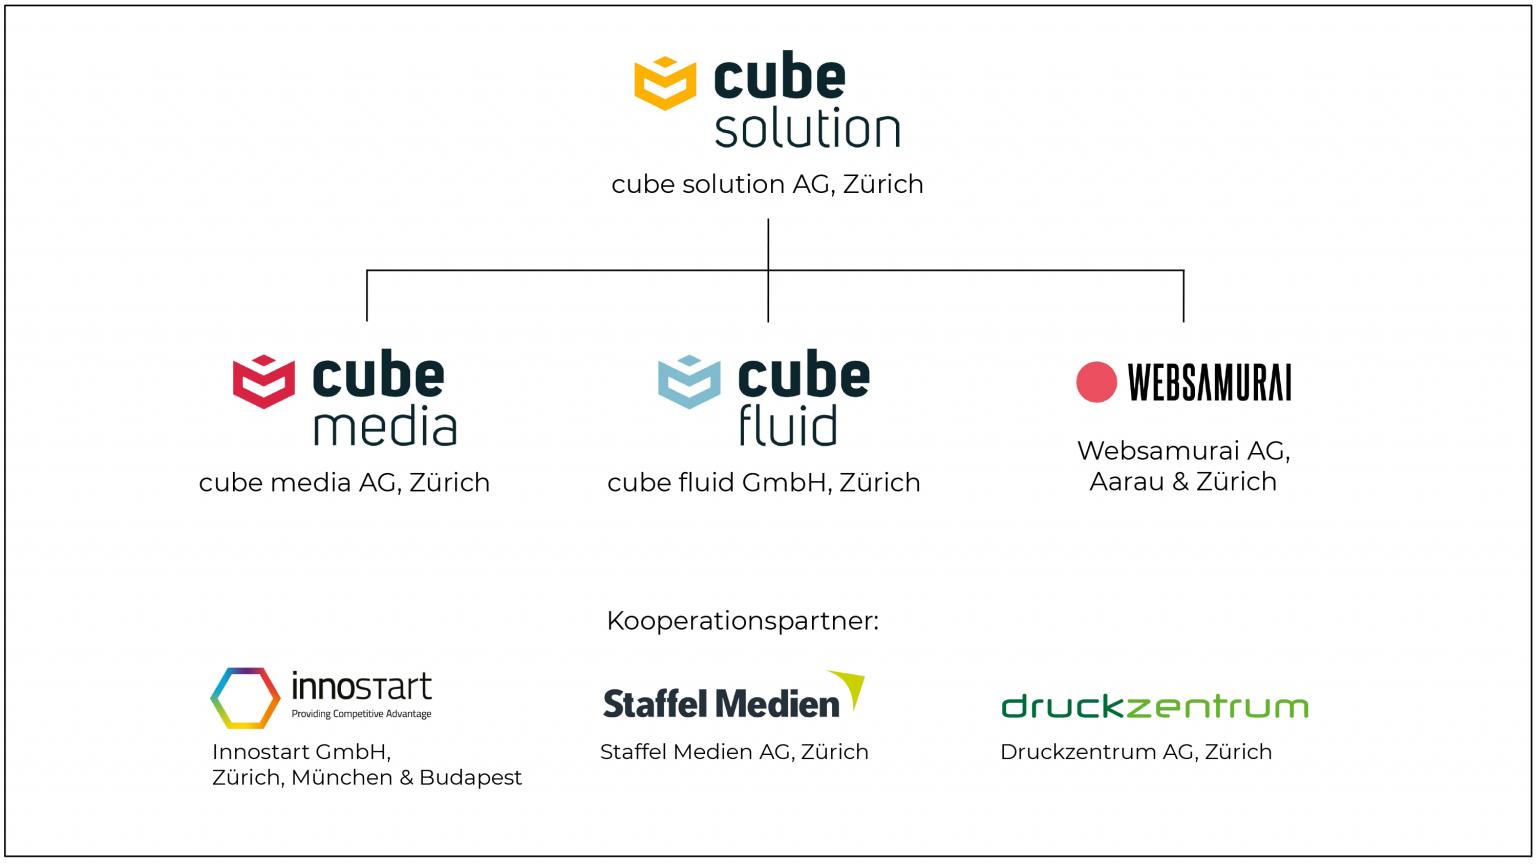 organigramm - cube fluid GmbH